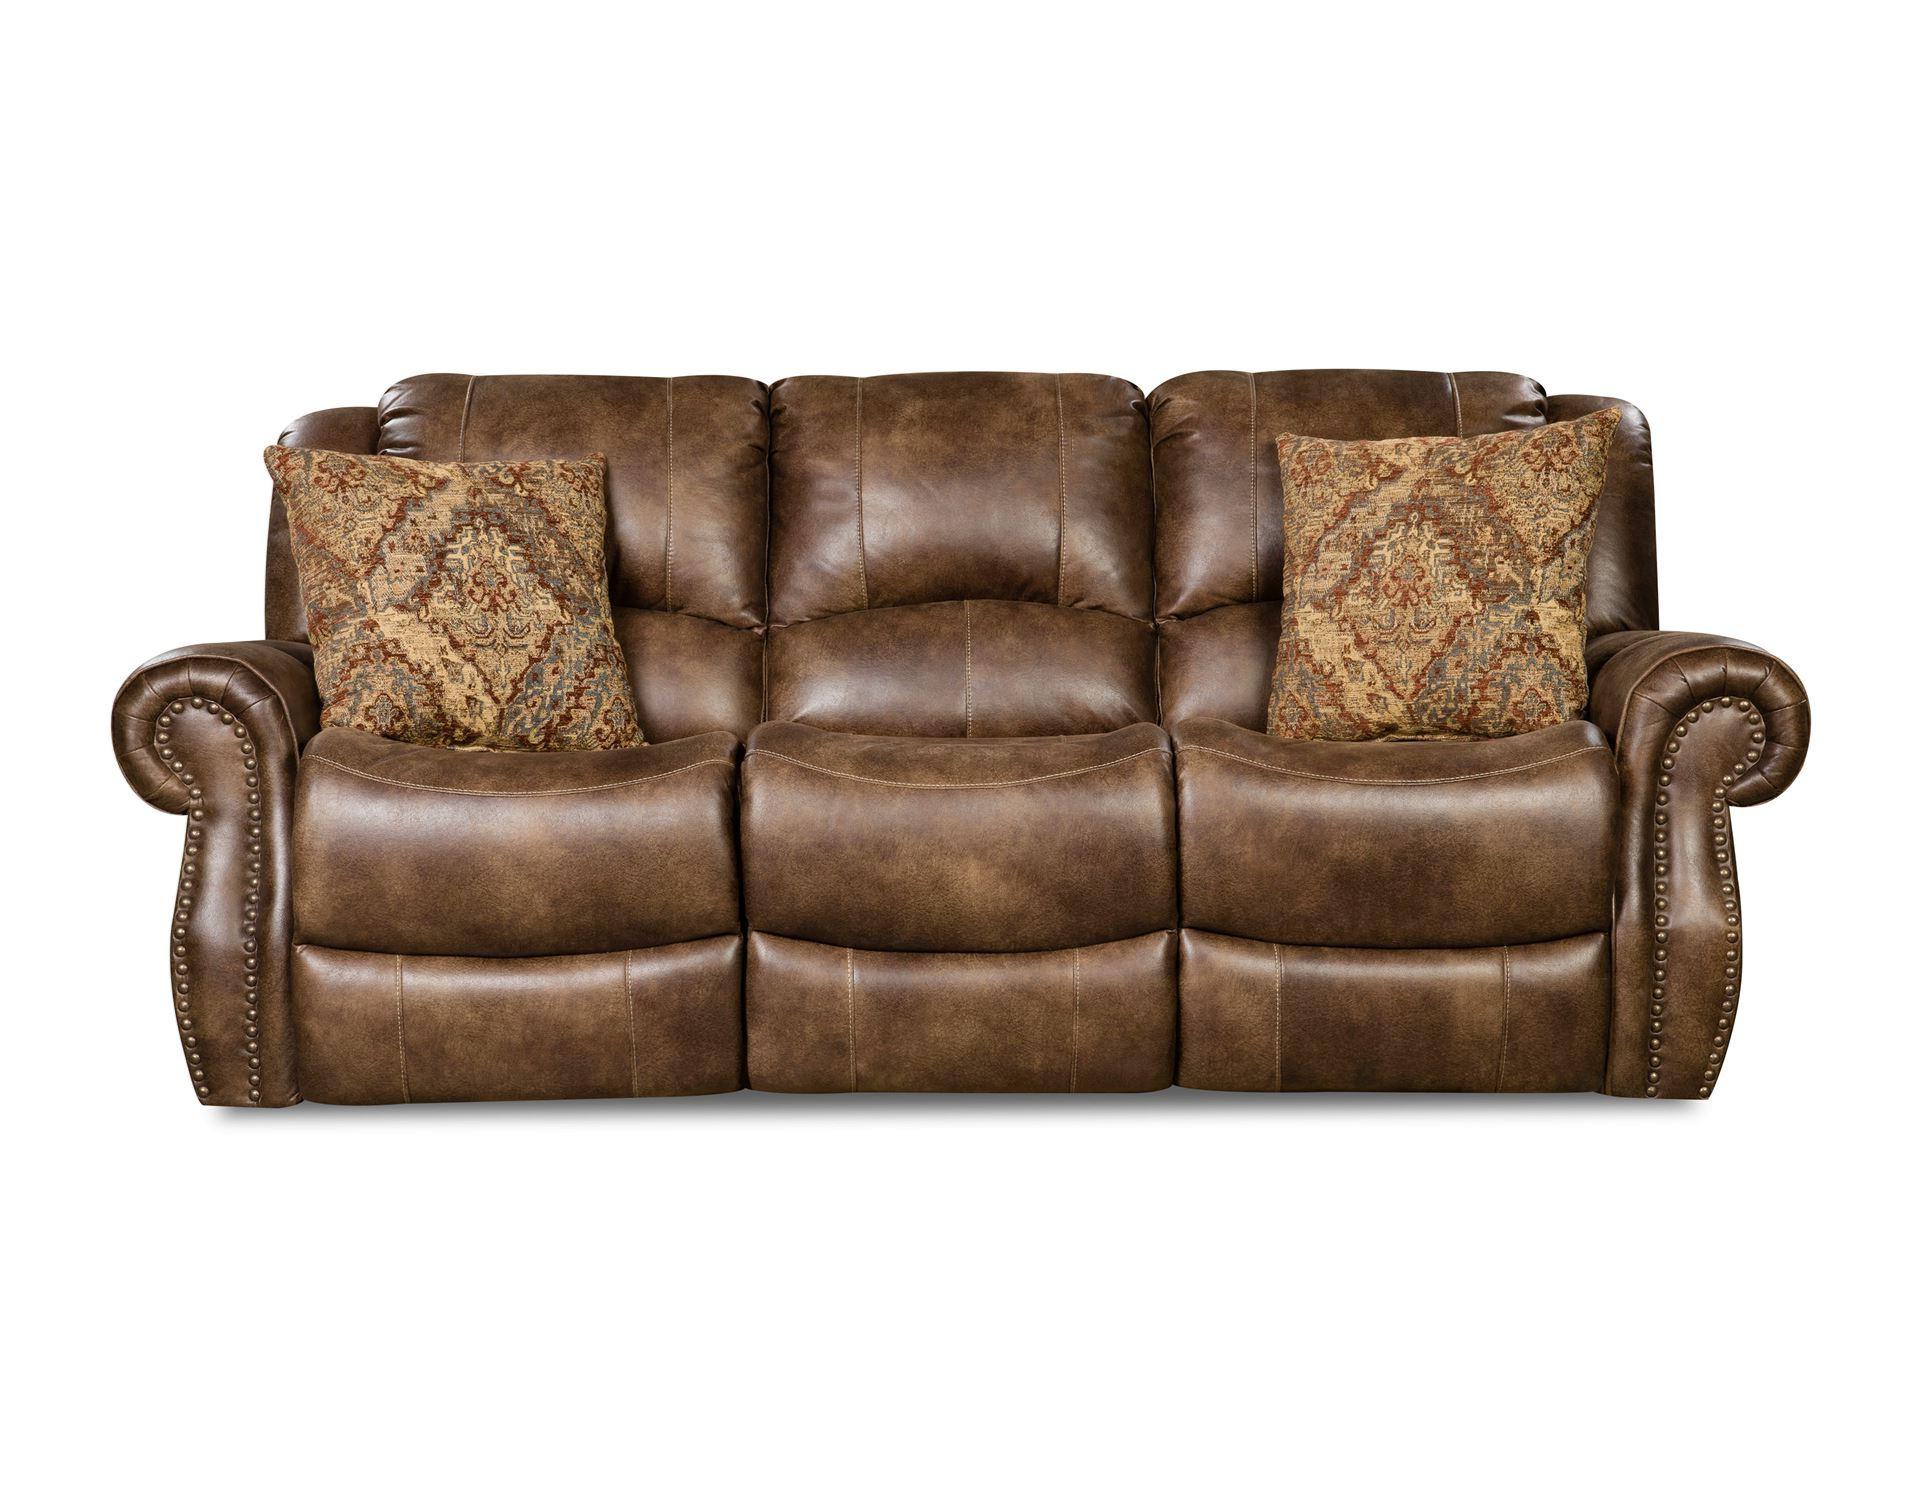 Waylon 3 Piece Power Reclining Sectionals For Most Recent Waylon – Mocha Reclining Sofa (View 16 of 20)